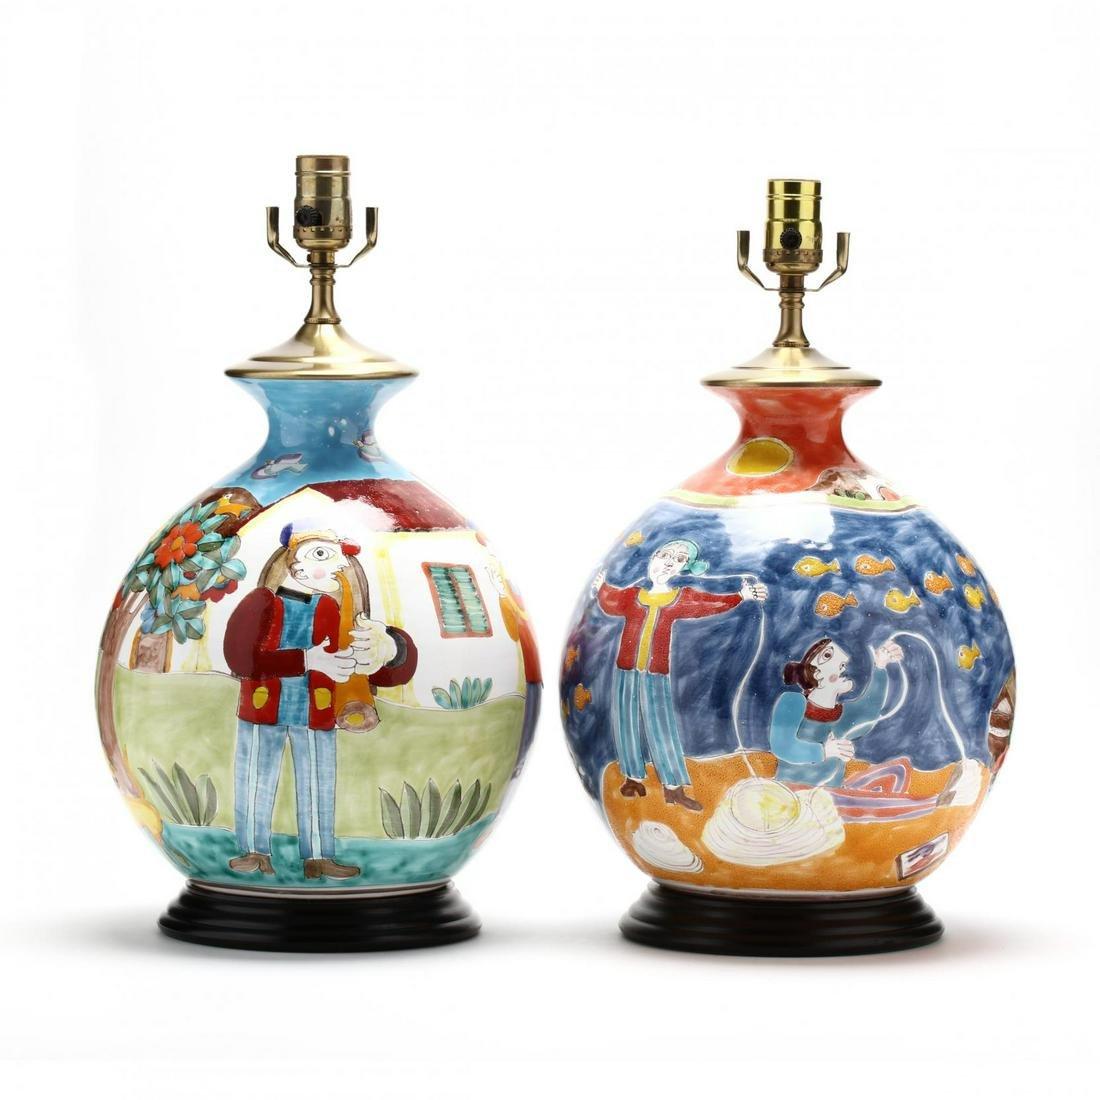 Giovanni DeSimone (Italy, 1930-1991), Pair of Decorated